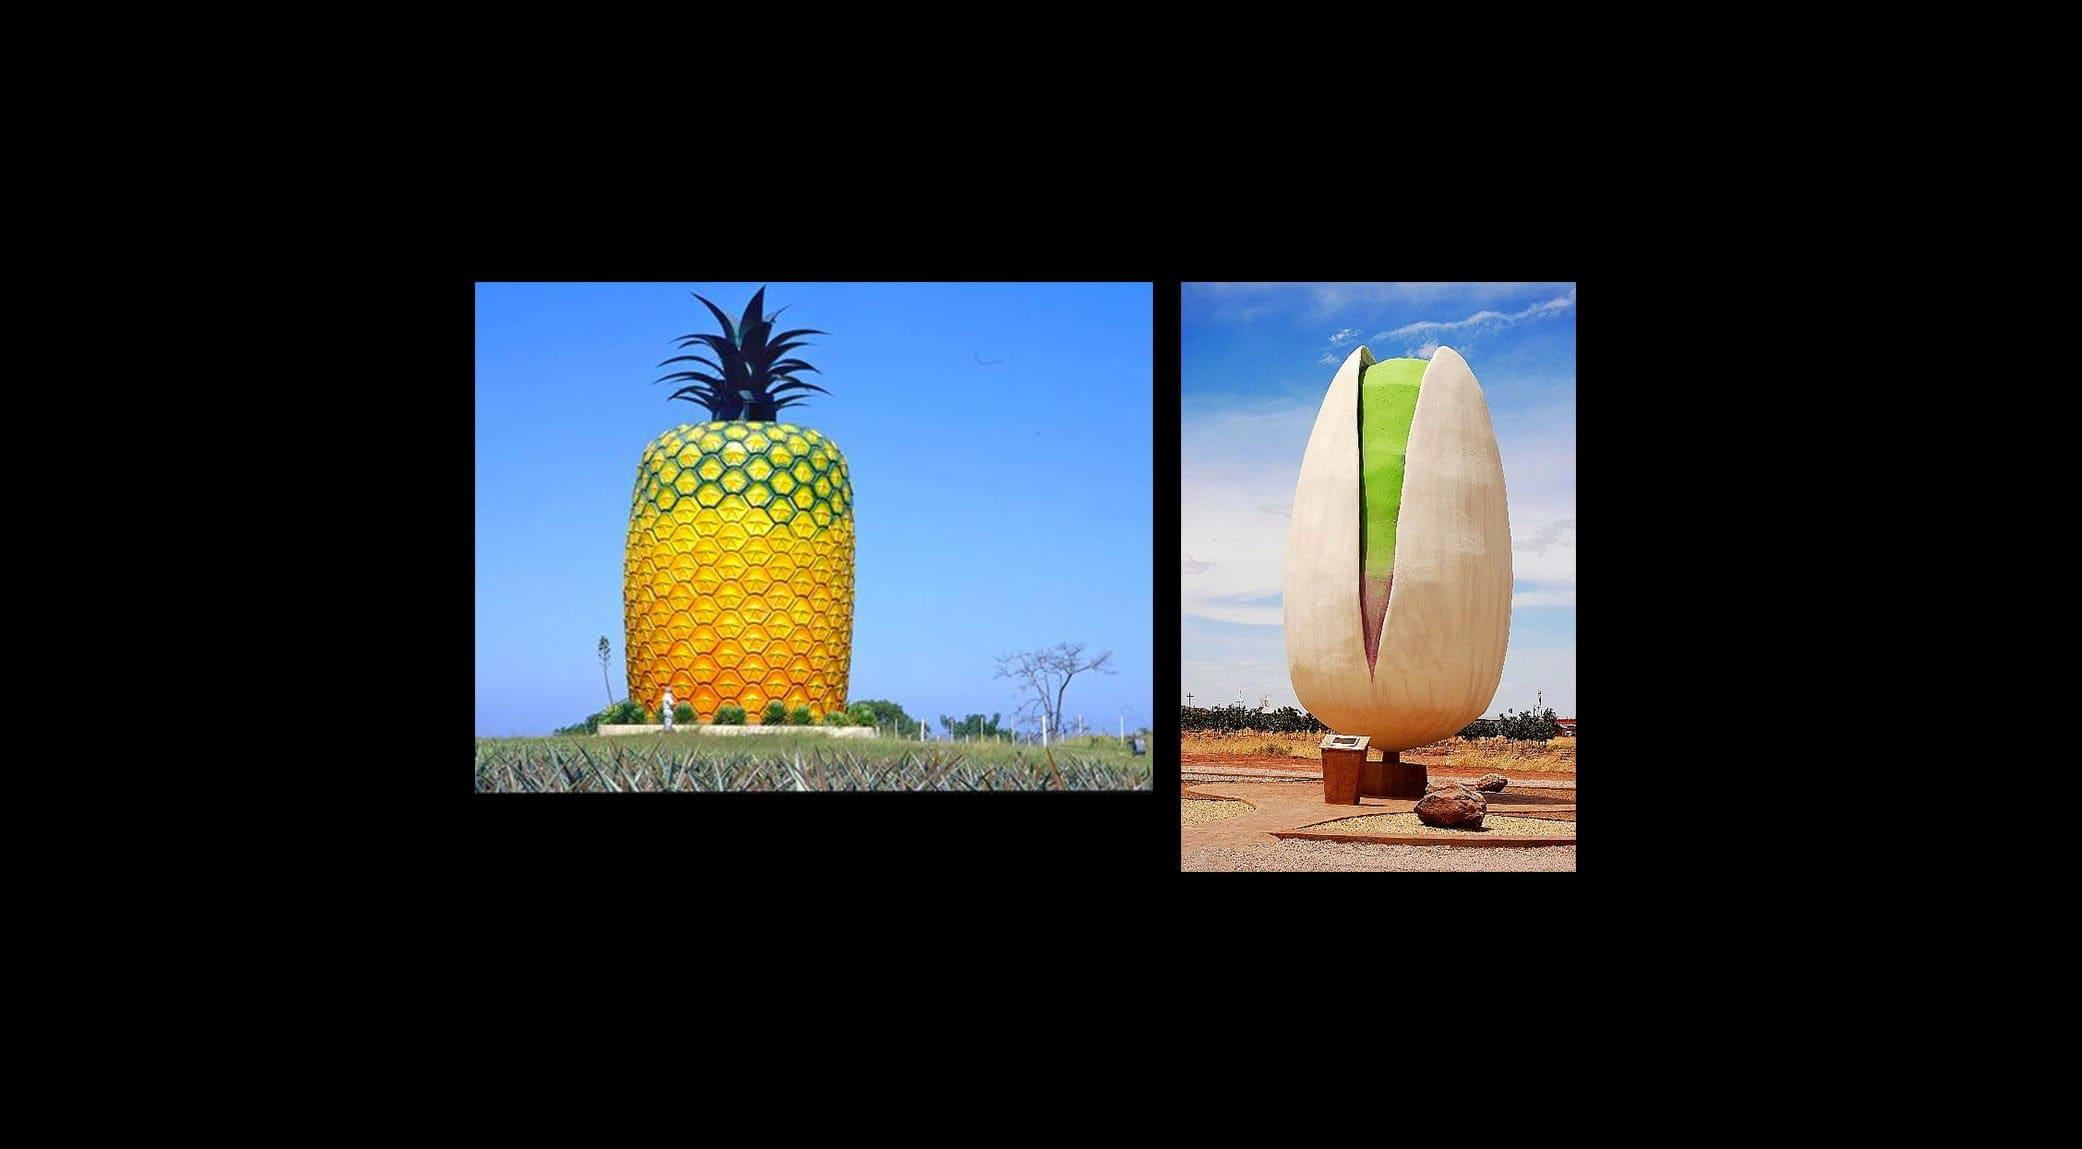 original_004-pineapple-pistacho-finedininglovers.jpg